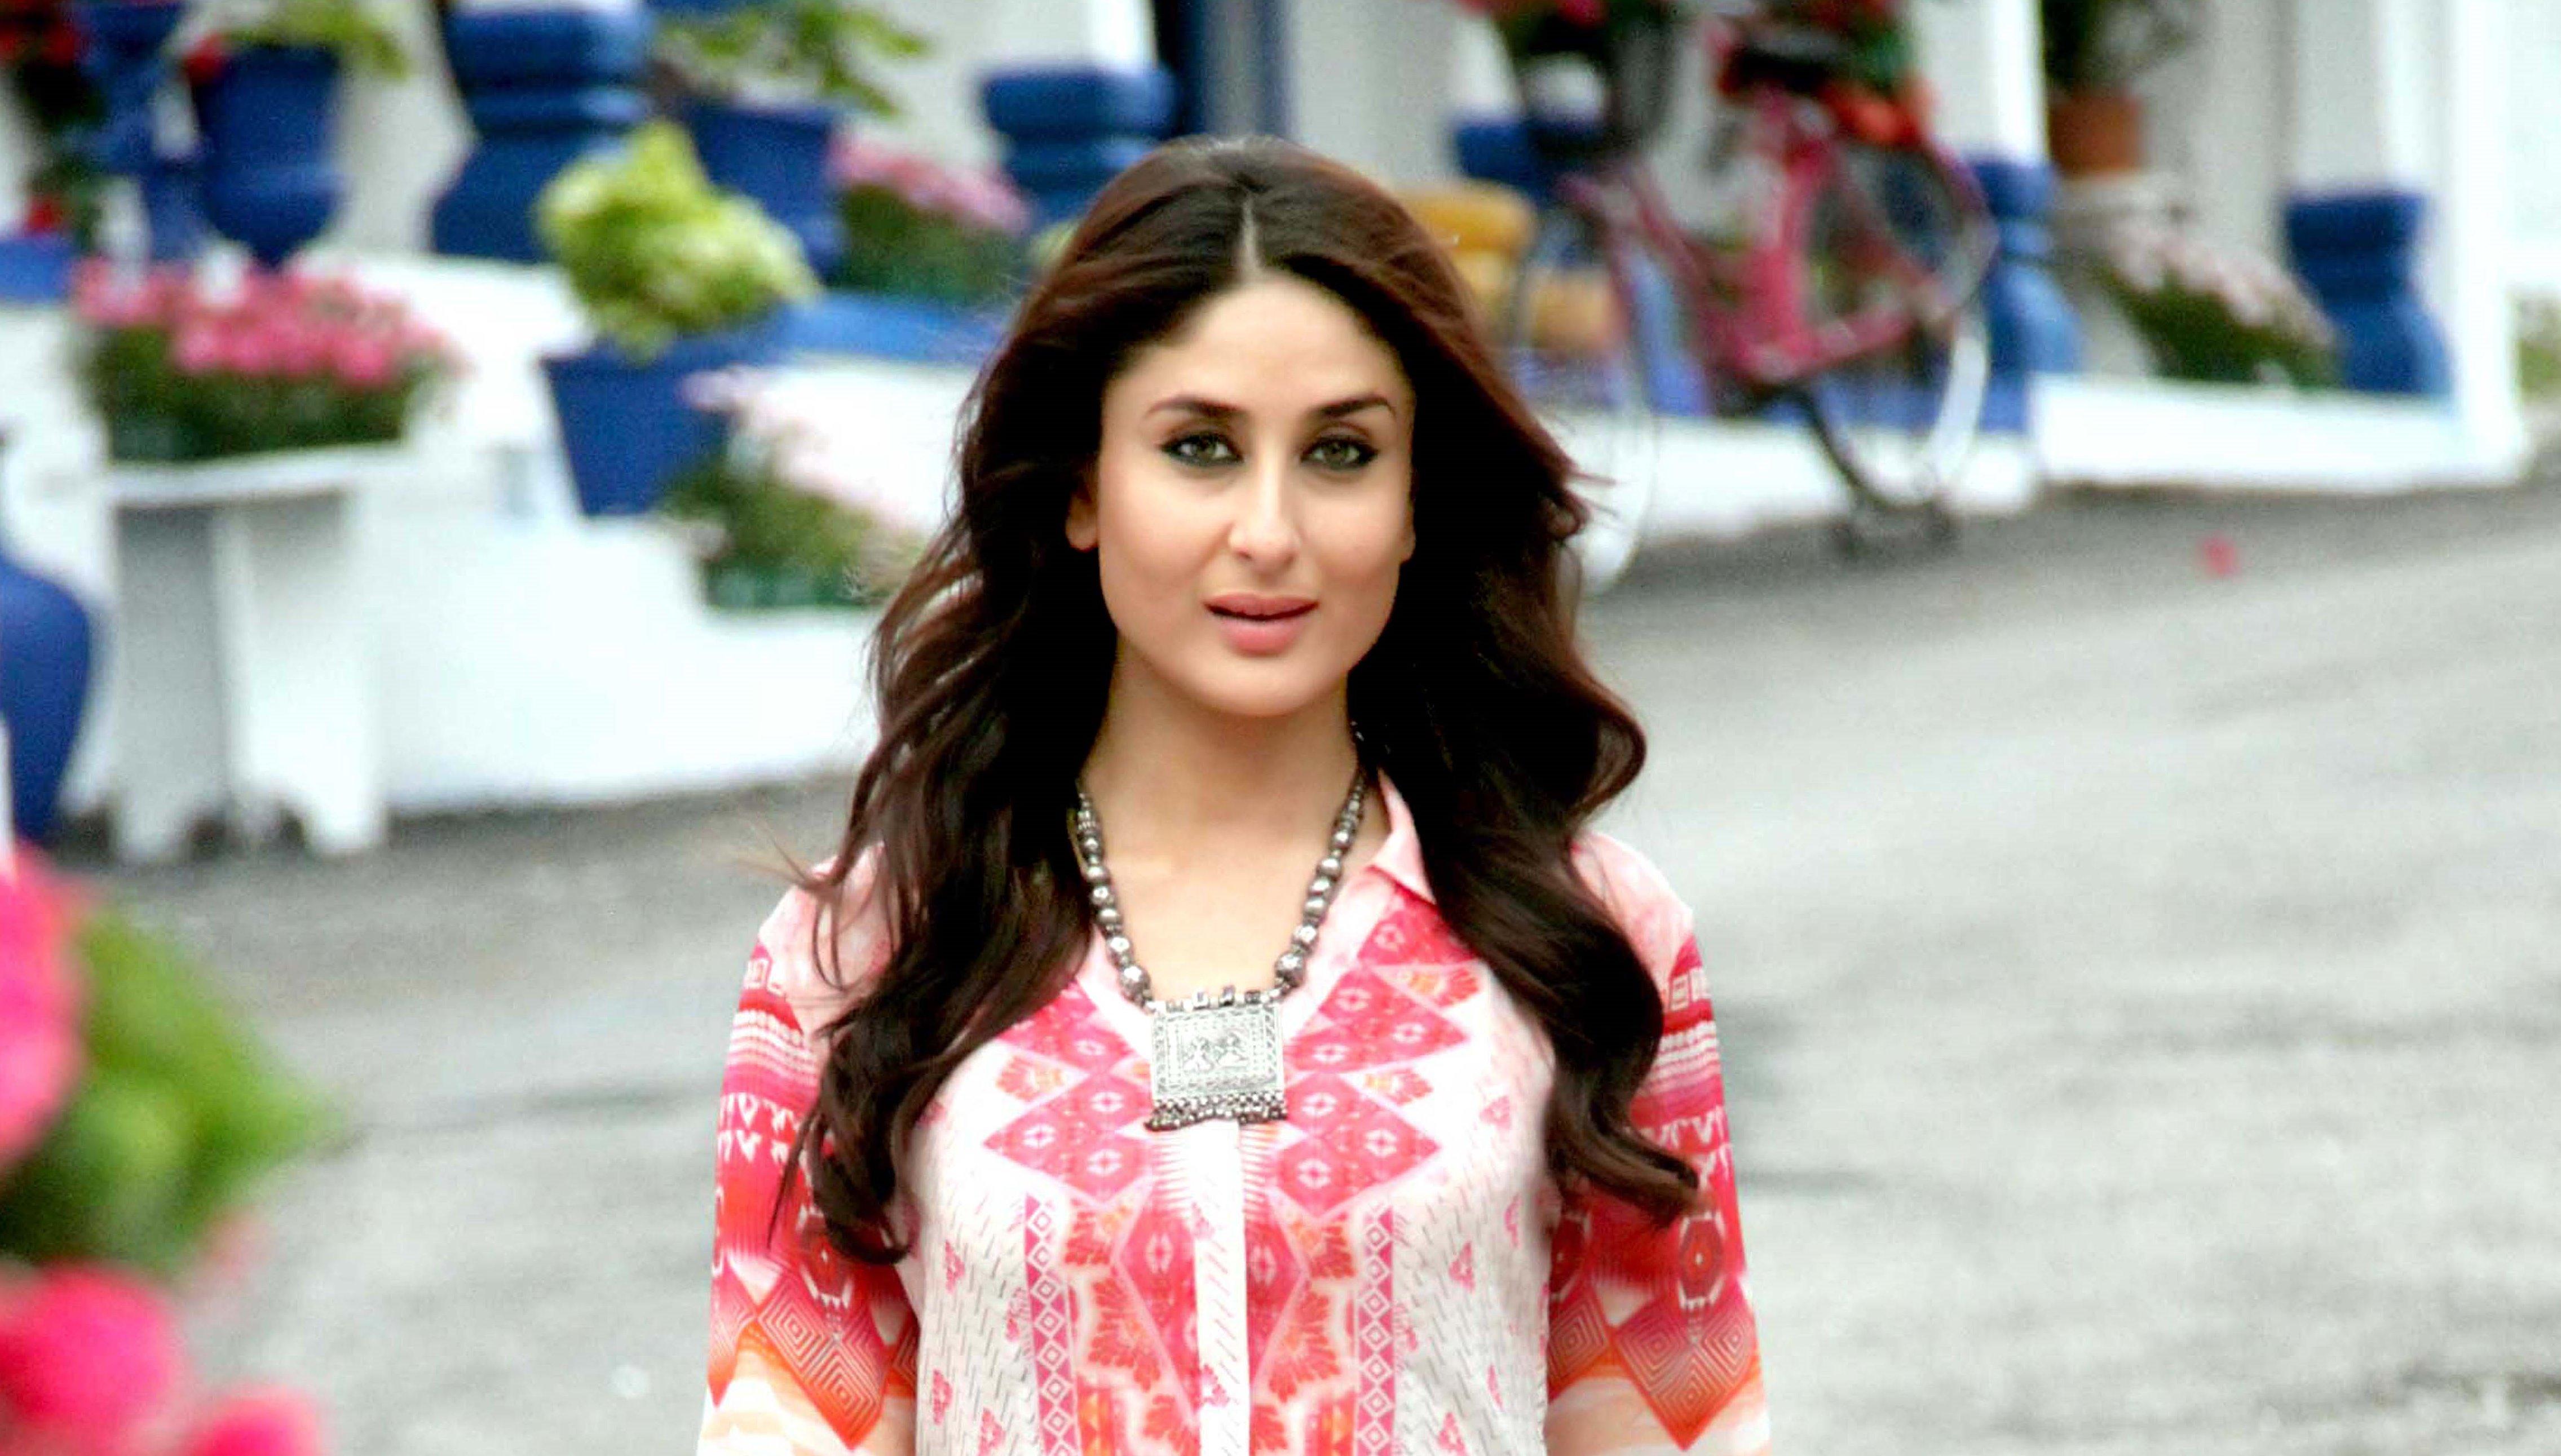 Kareena Kapoor Beautiful HD Wallpaper 2015 4542x2583